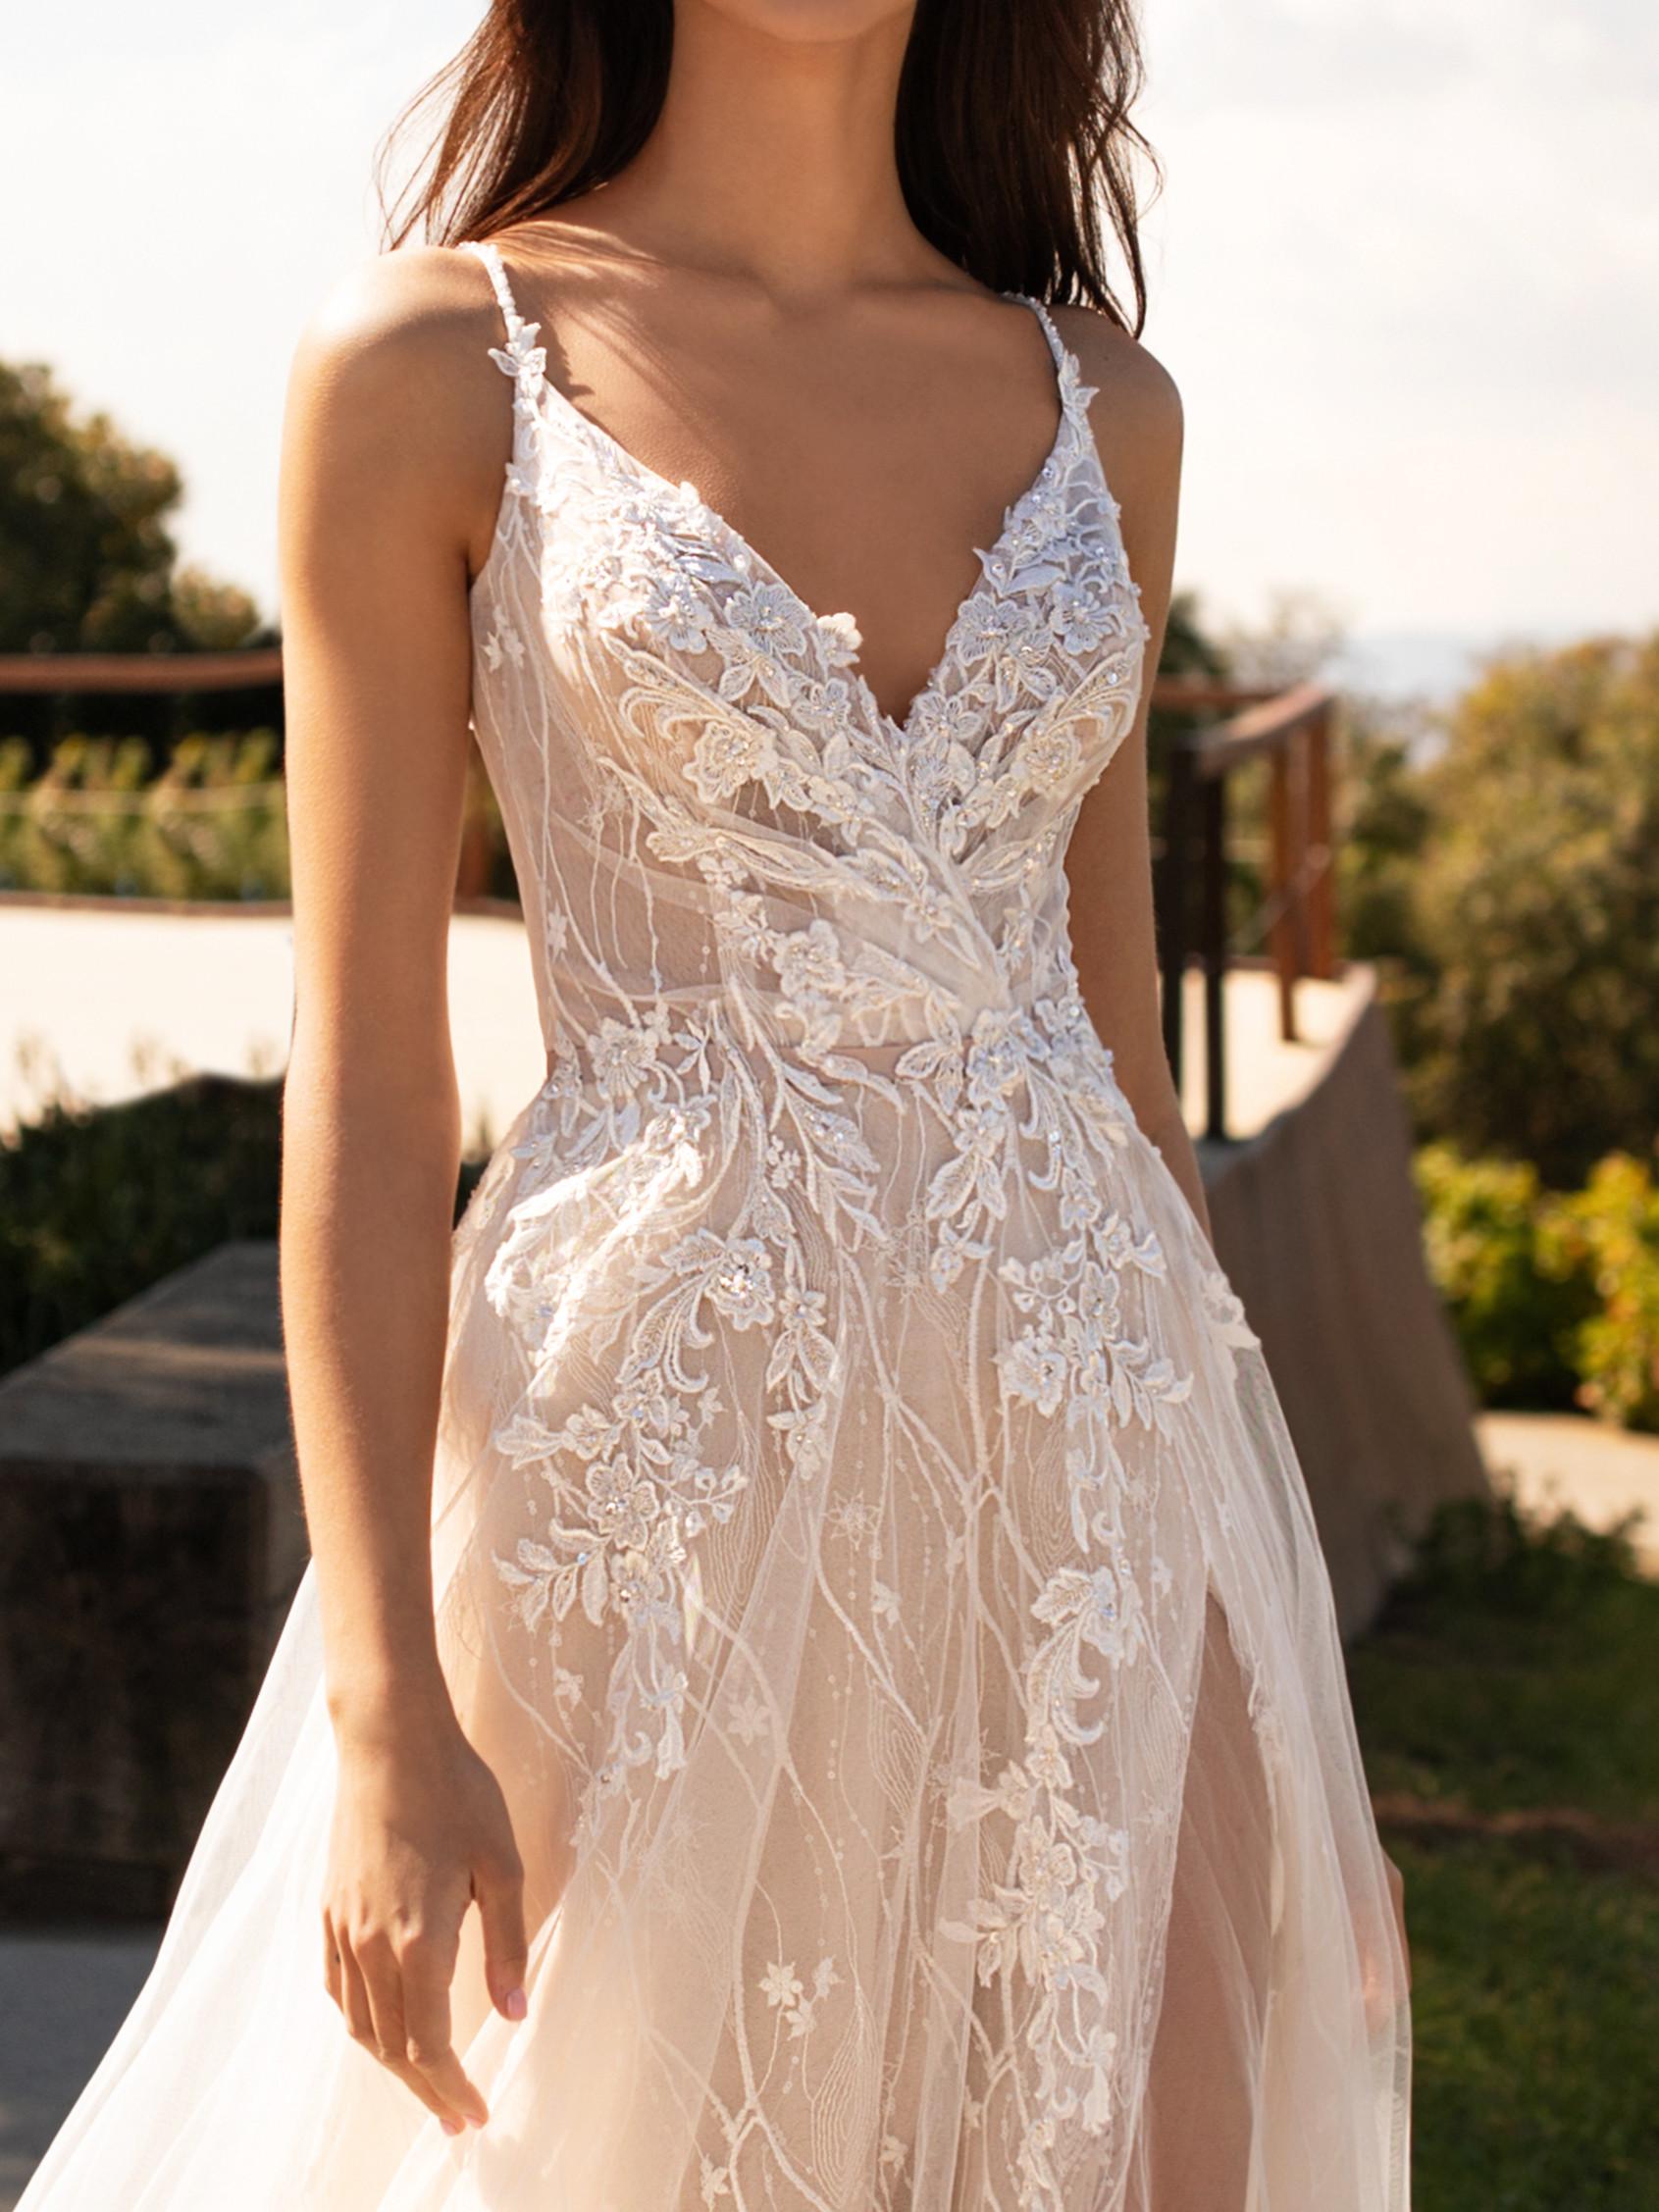 Mira Couture Pronovias Hyperion Wedding Dress Bridal Gown Barcelona Designer Chicago Boutique Front Detail 2